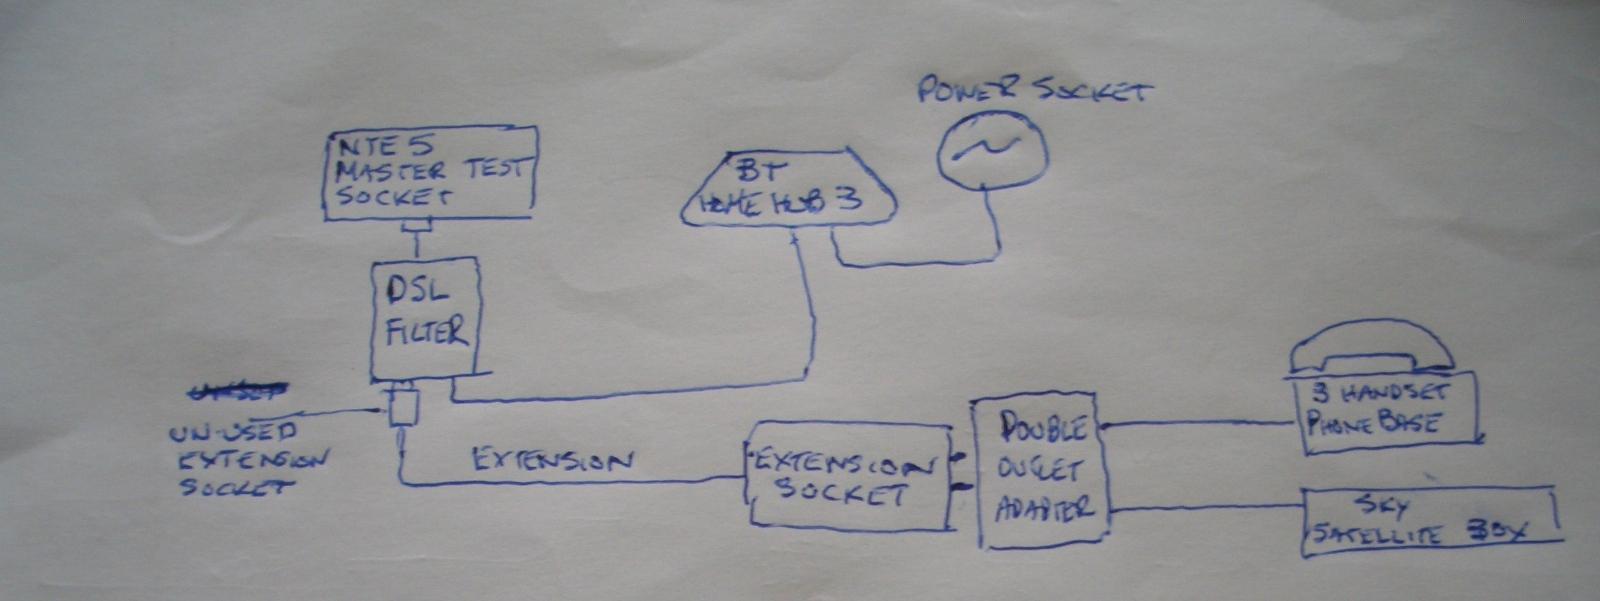 medium resolution of bt infinity wiring diagram wiring diagram blog passive optical network bt infinity wiring diagram